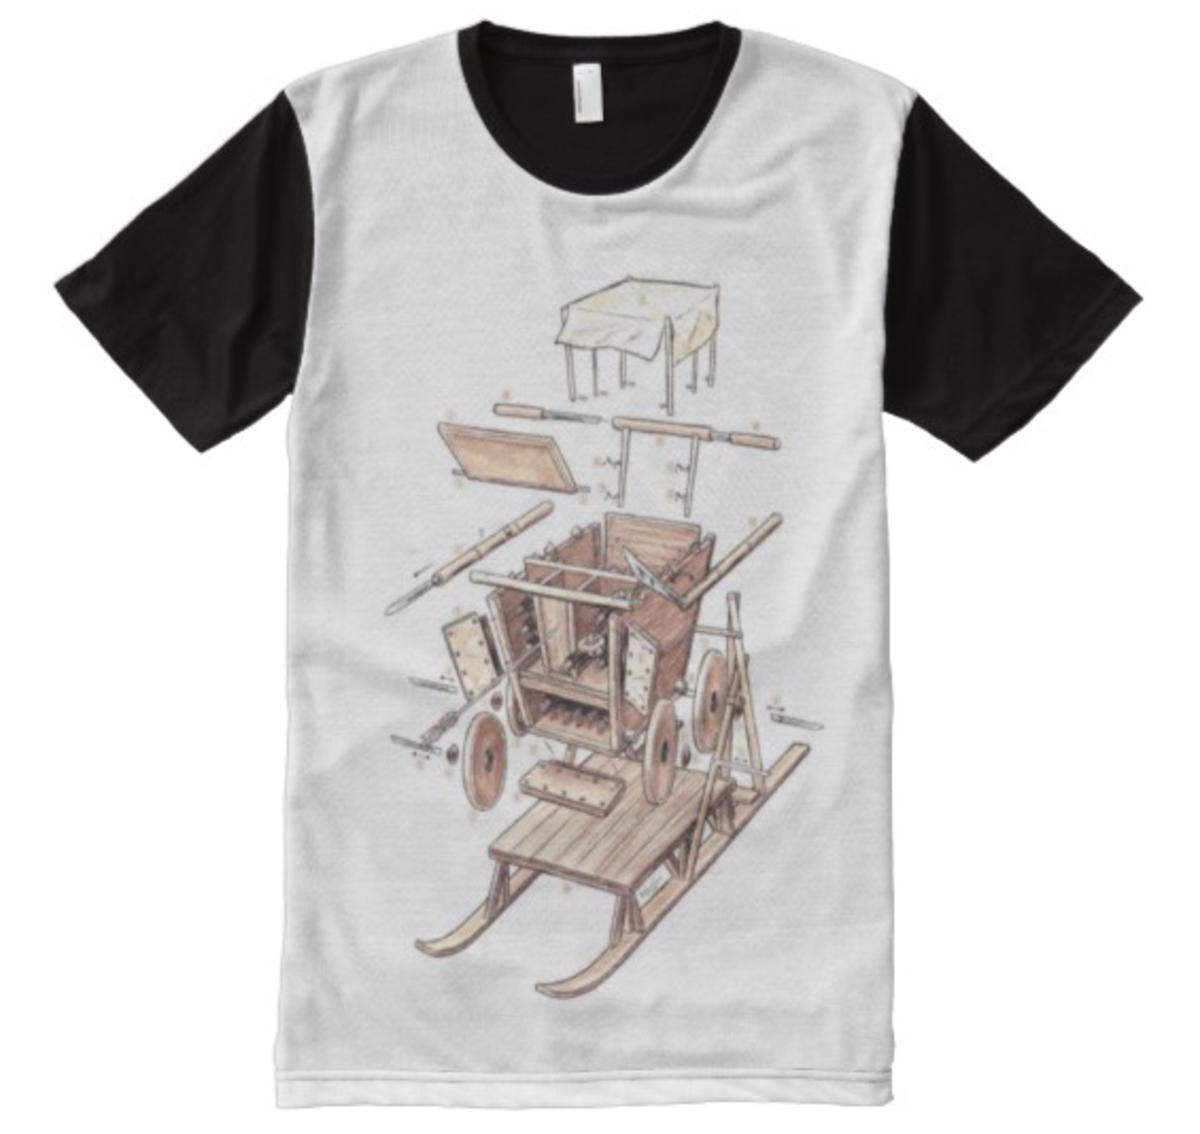 Shogun Assassin T-Shirts